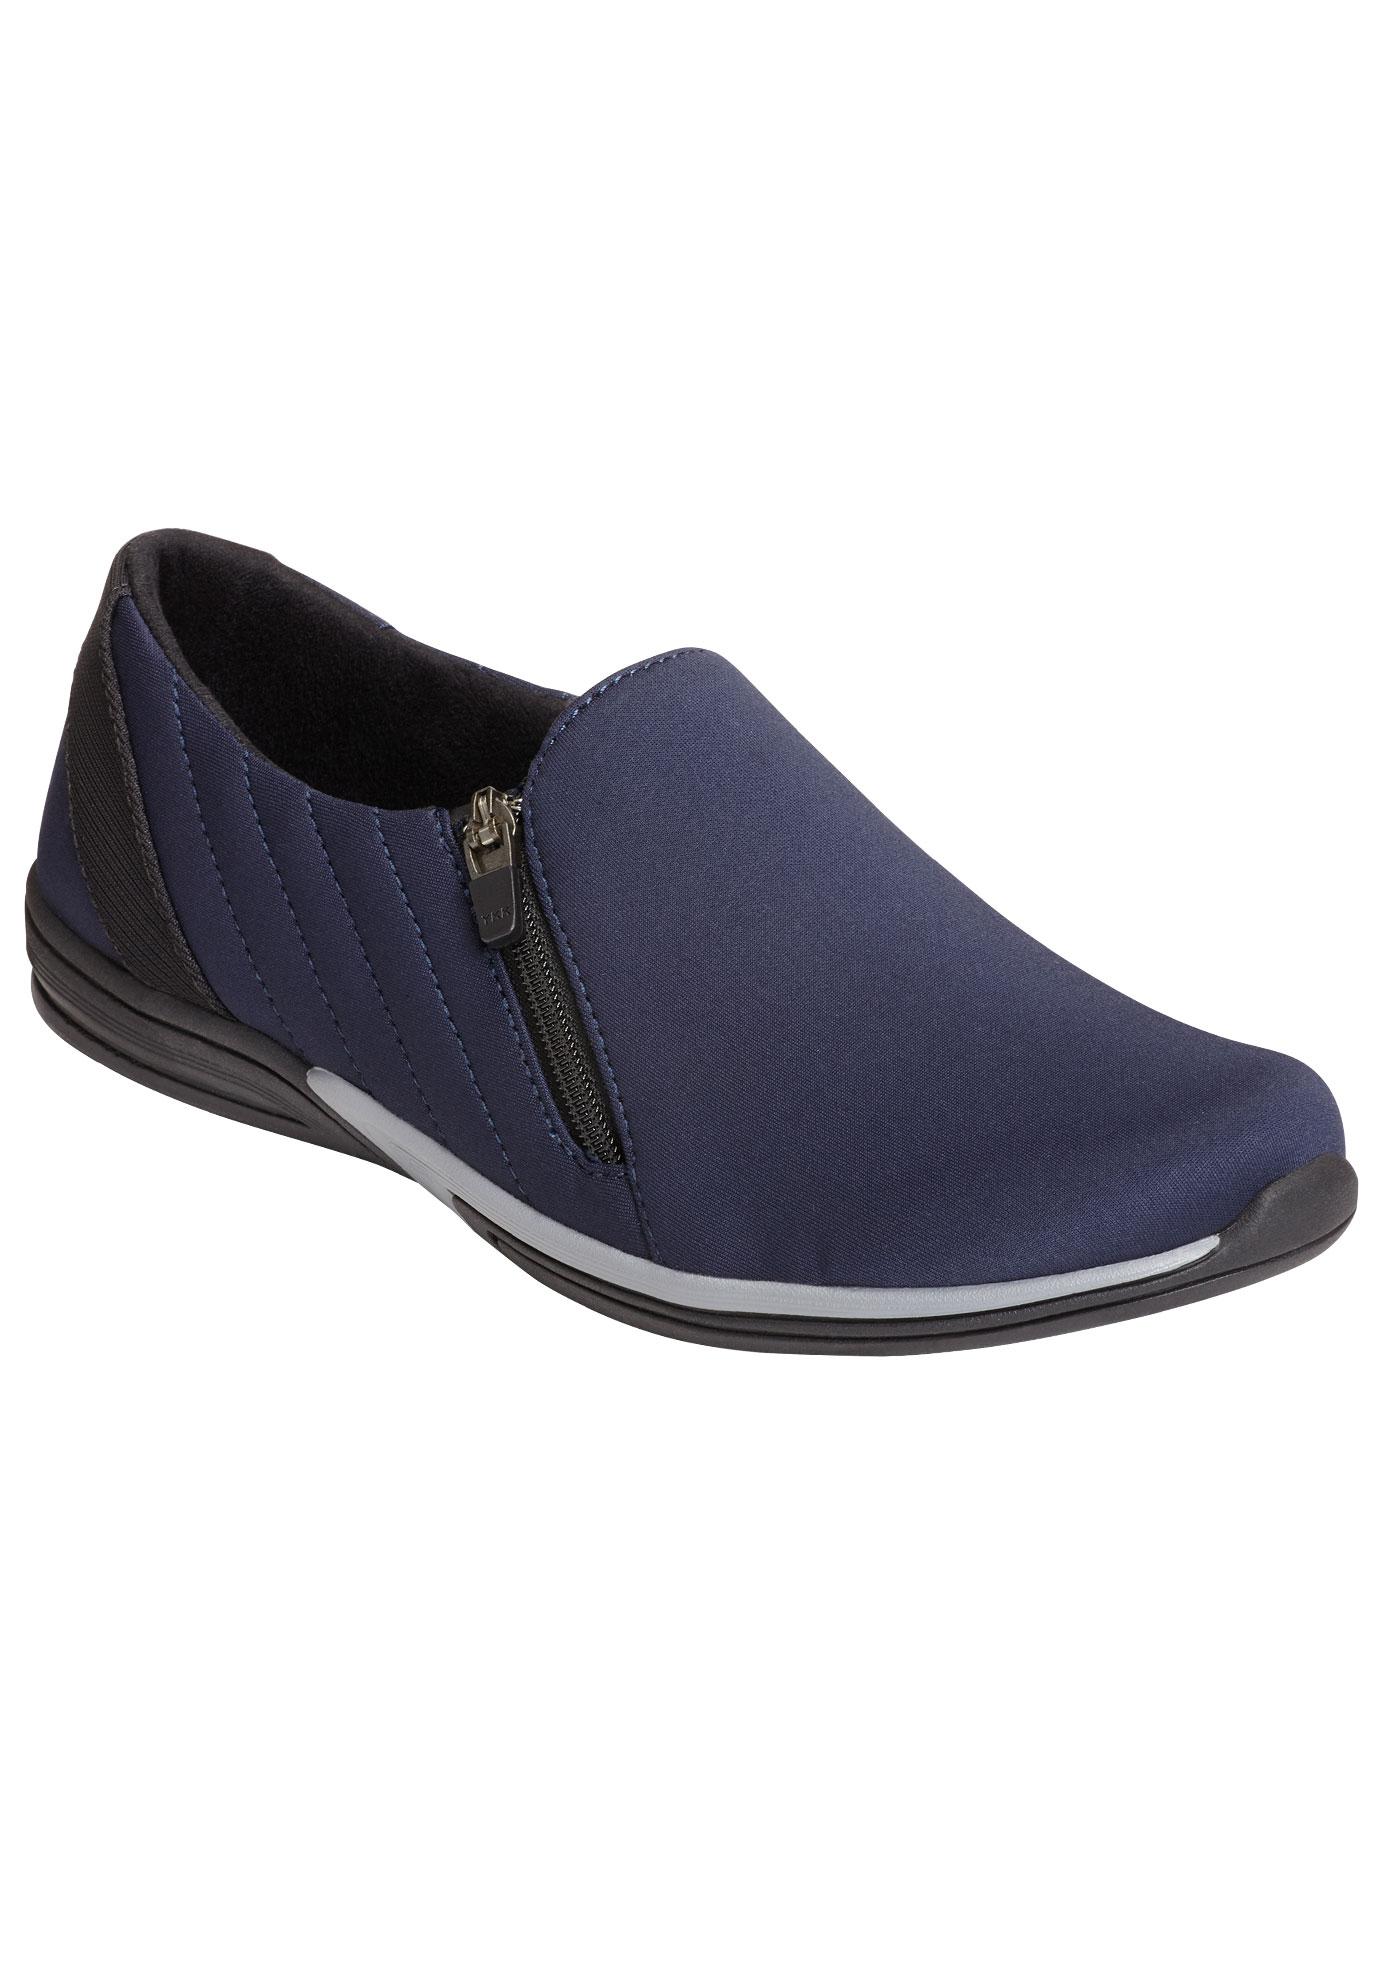 A2 by Aerosoles Envelope Sneakers RIW5oT5q